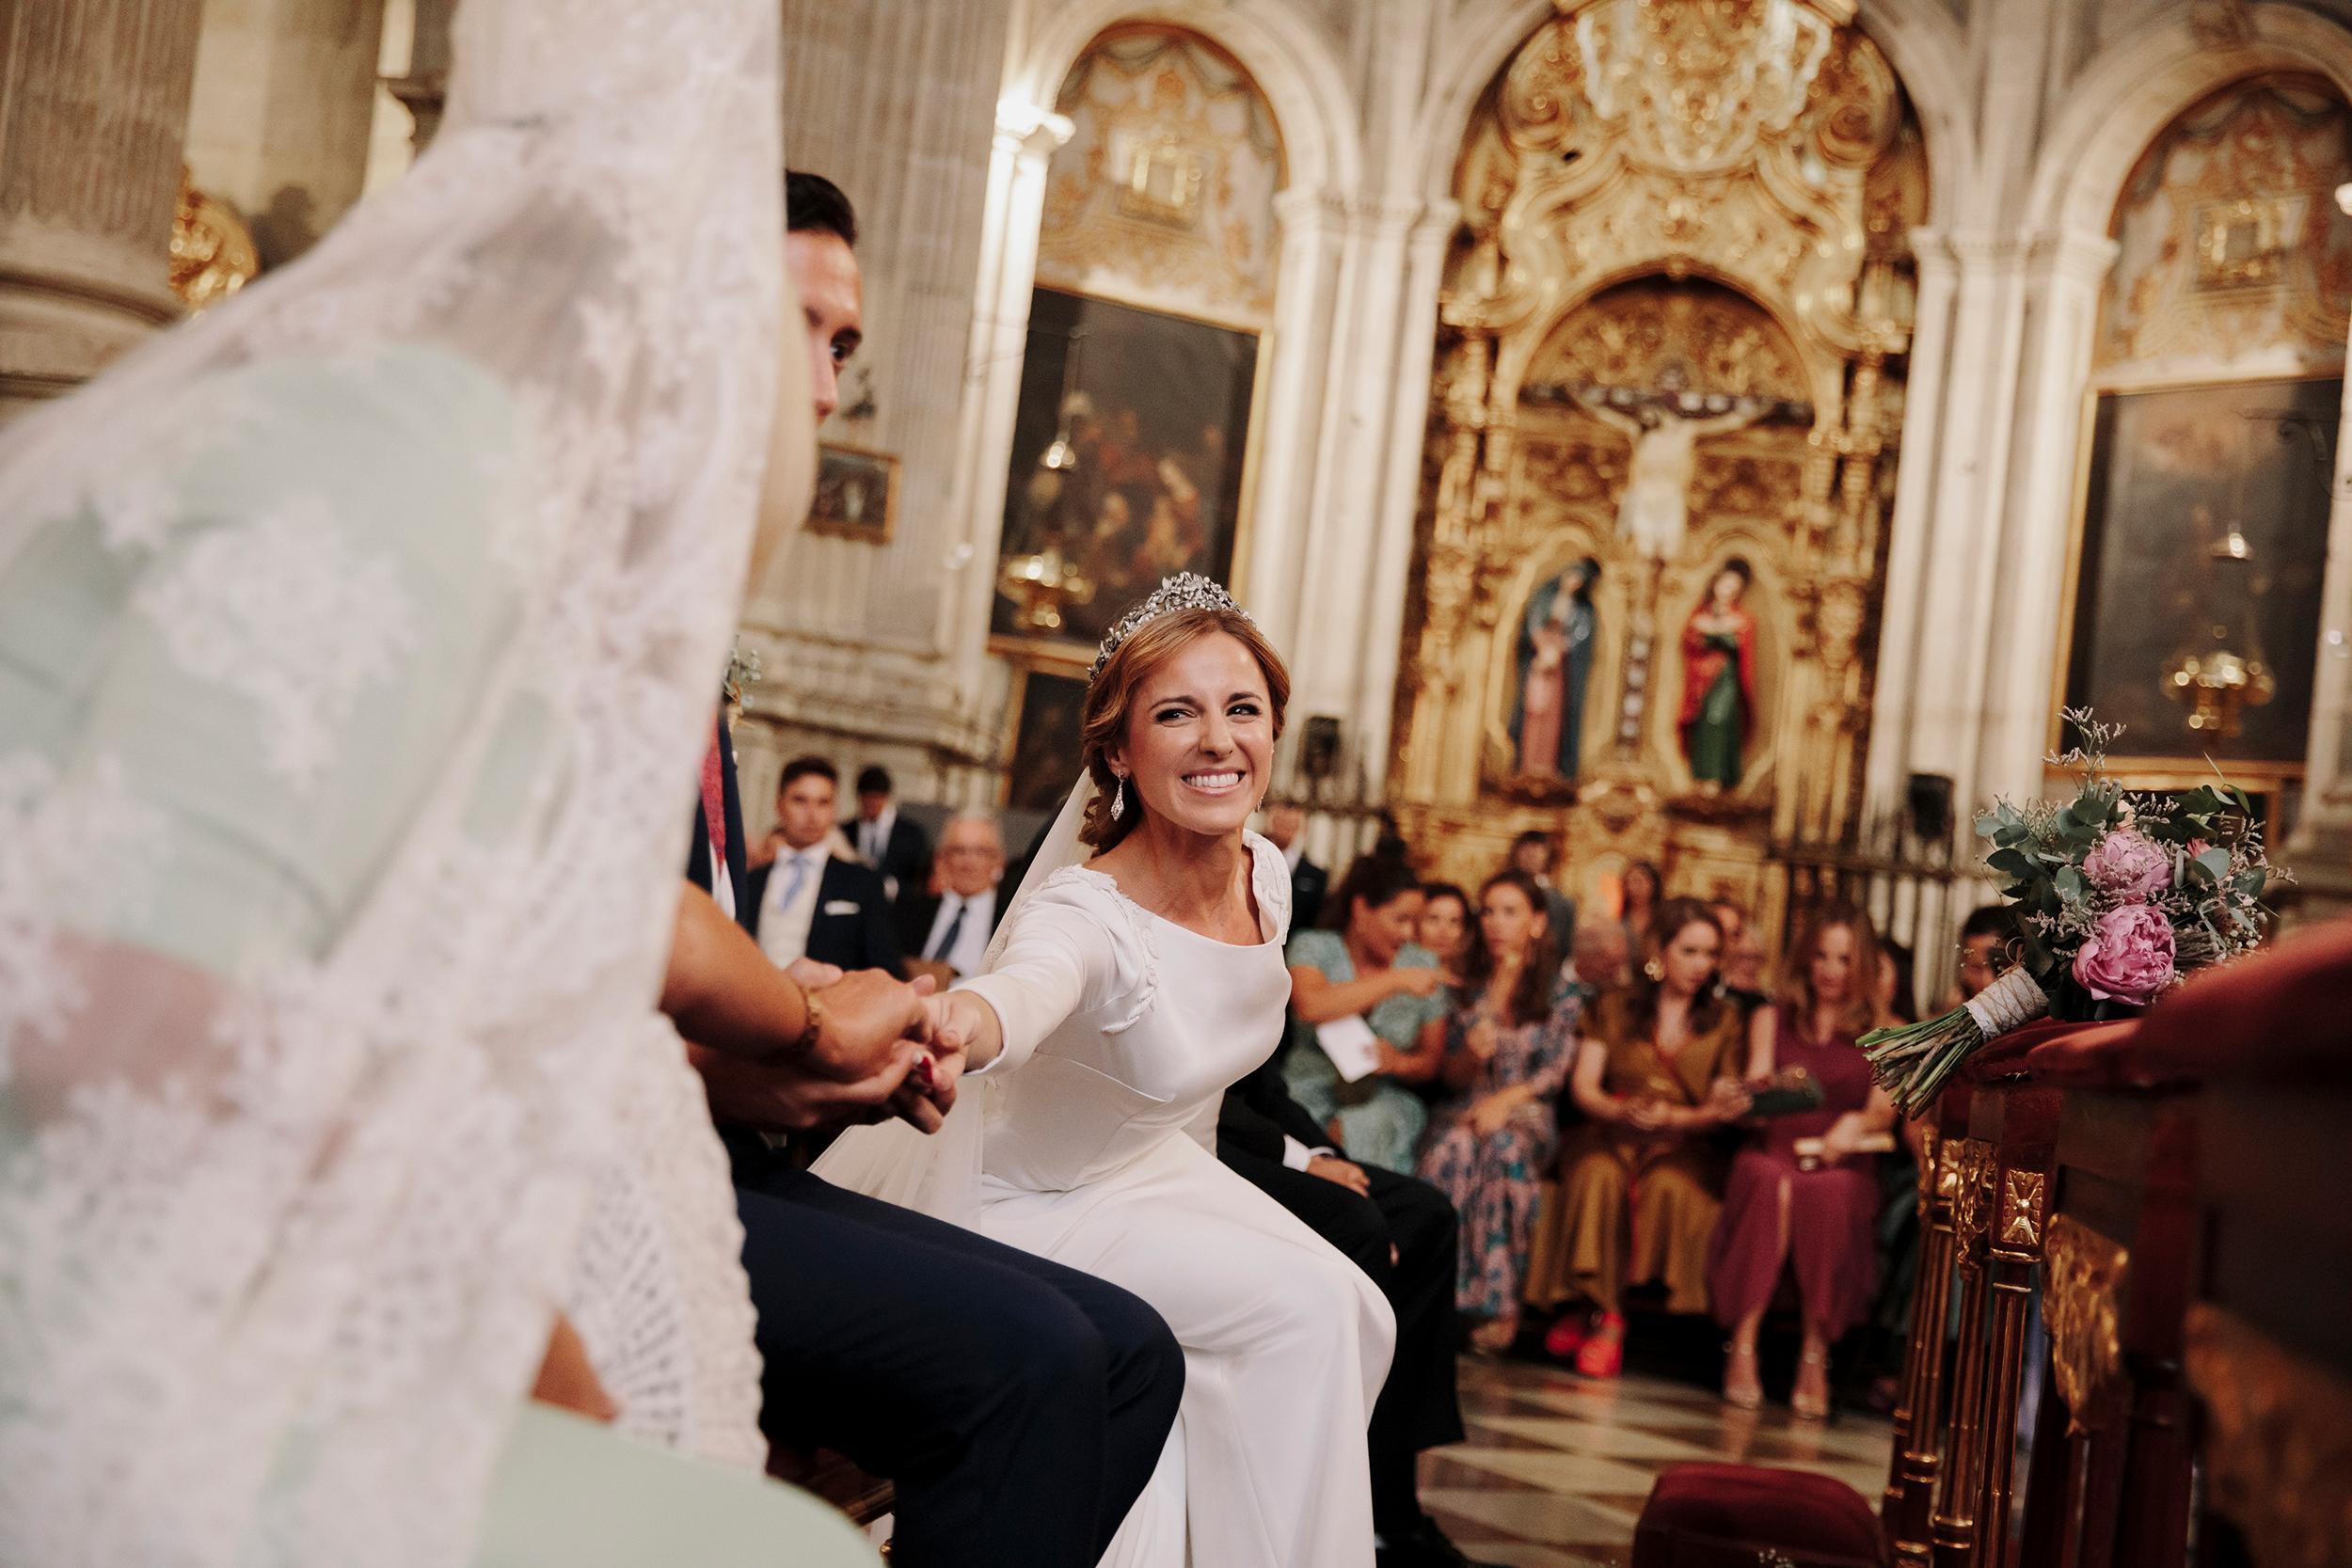 fotografo-bodas-granada-catedral-sagrario-jose-reyes_042.jpg